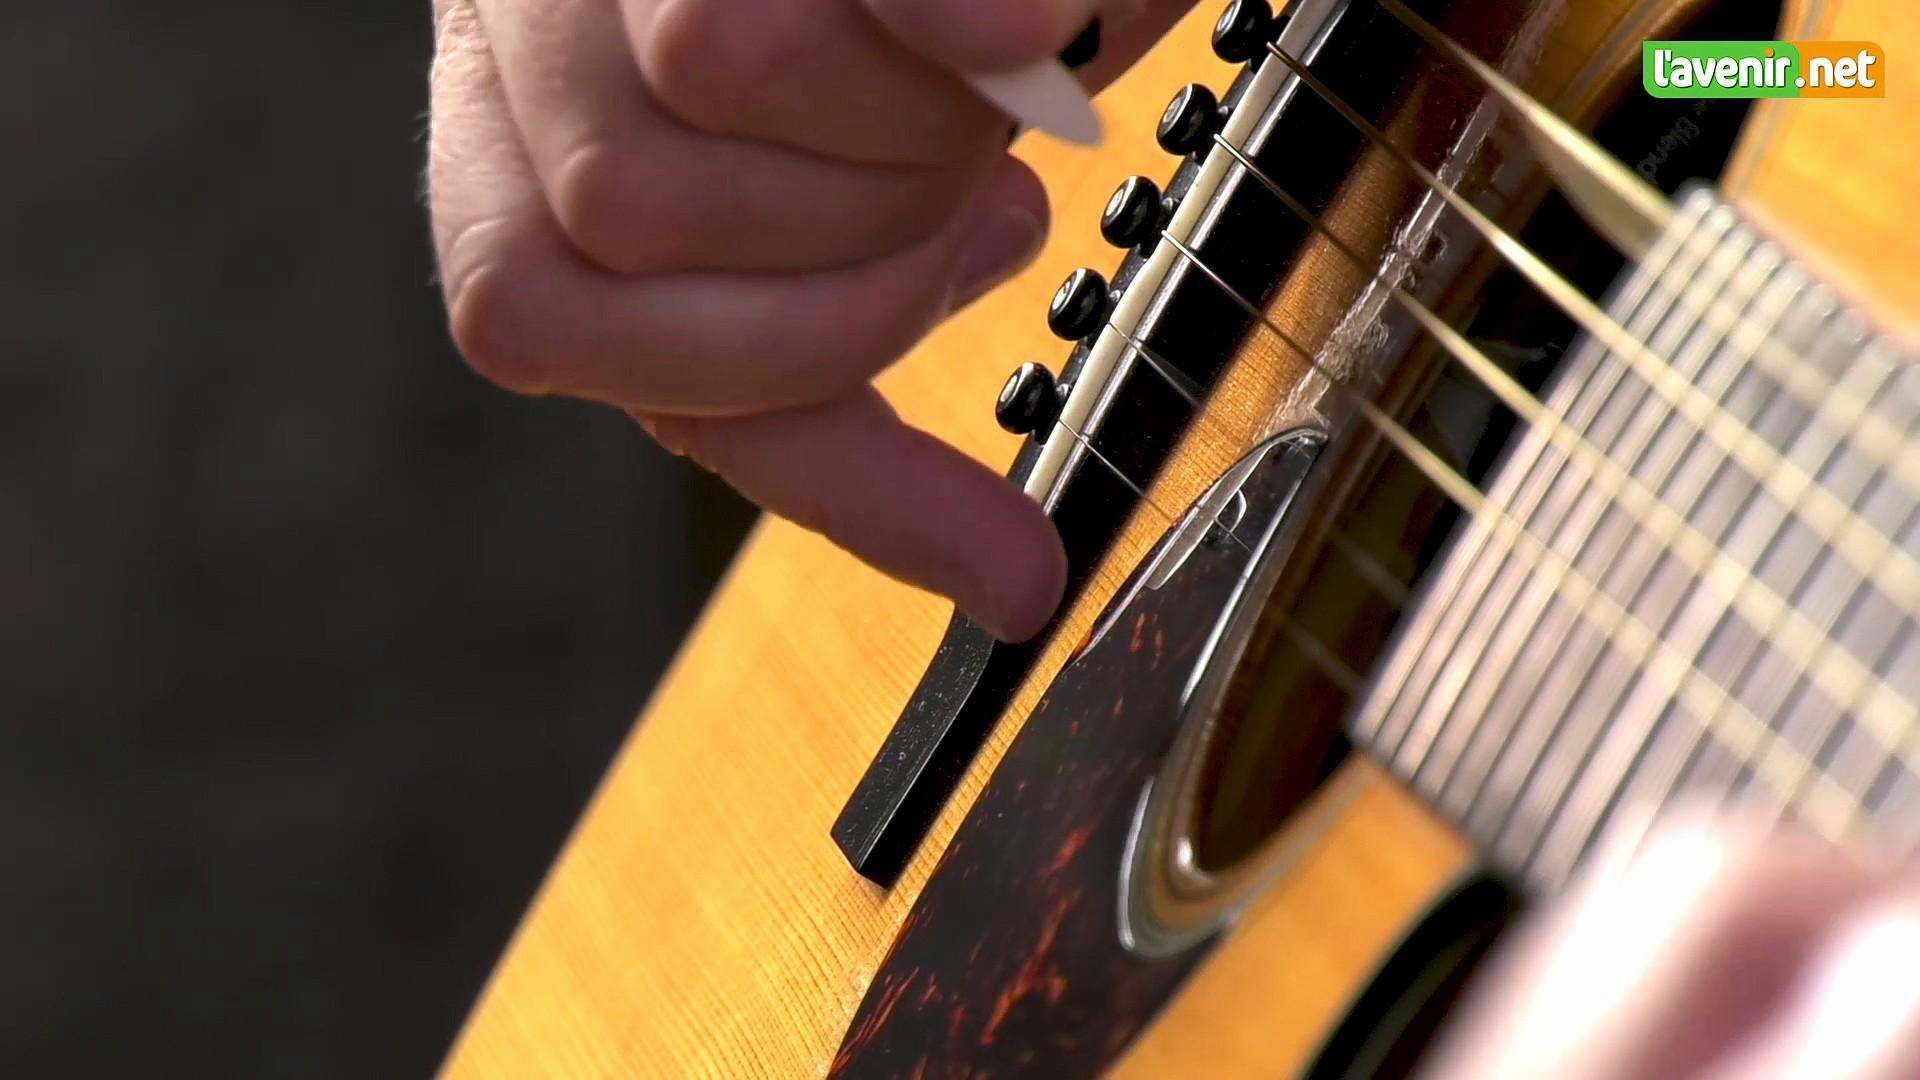 hight resolution of 1920x1080 guitar wallpaper shine gibson jazz style guitar